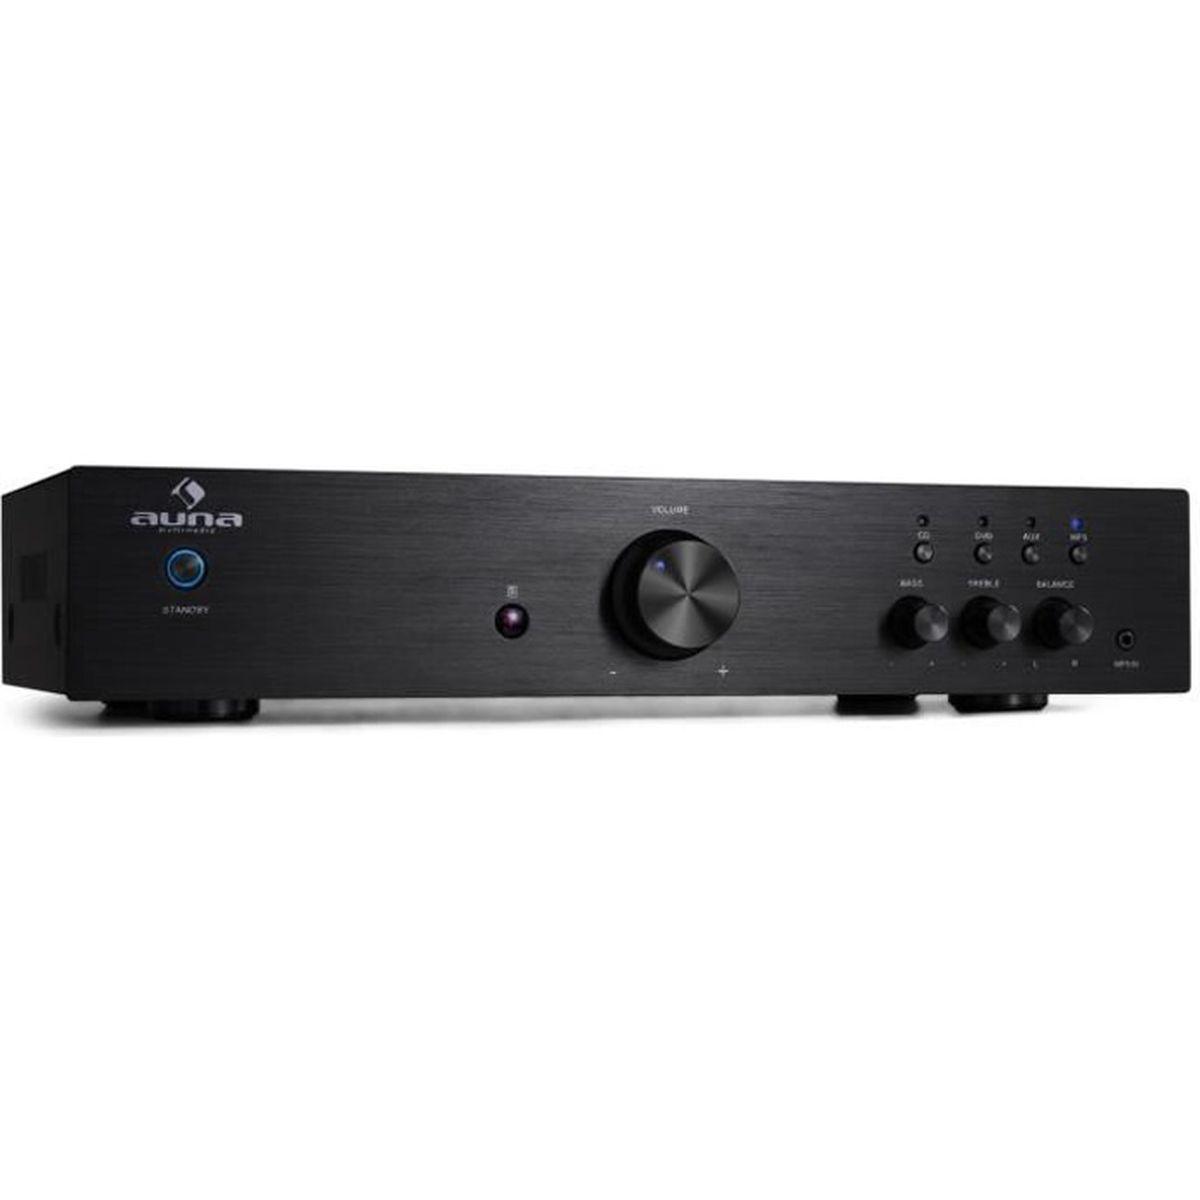 AMPLIFICATEUR HIFI auna AV2-CD508 - Ampli HiFi Stereo avec 3 entrées